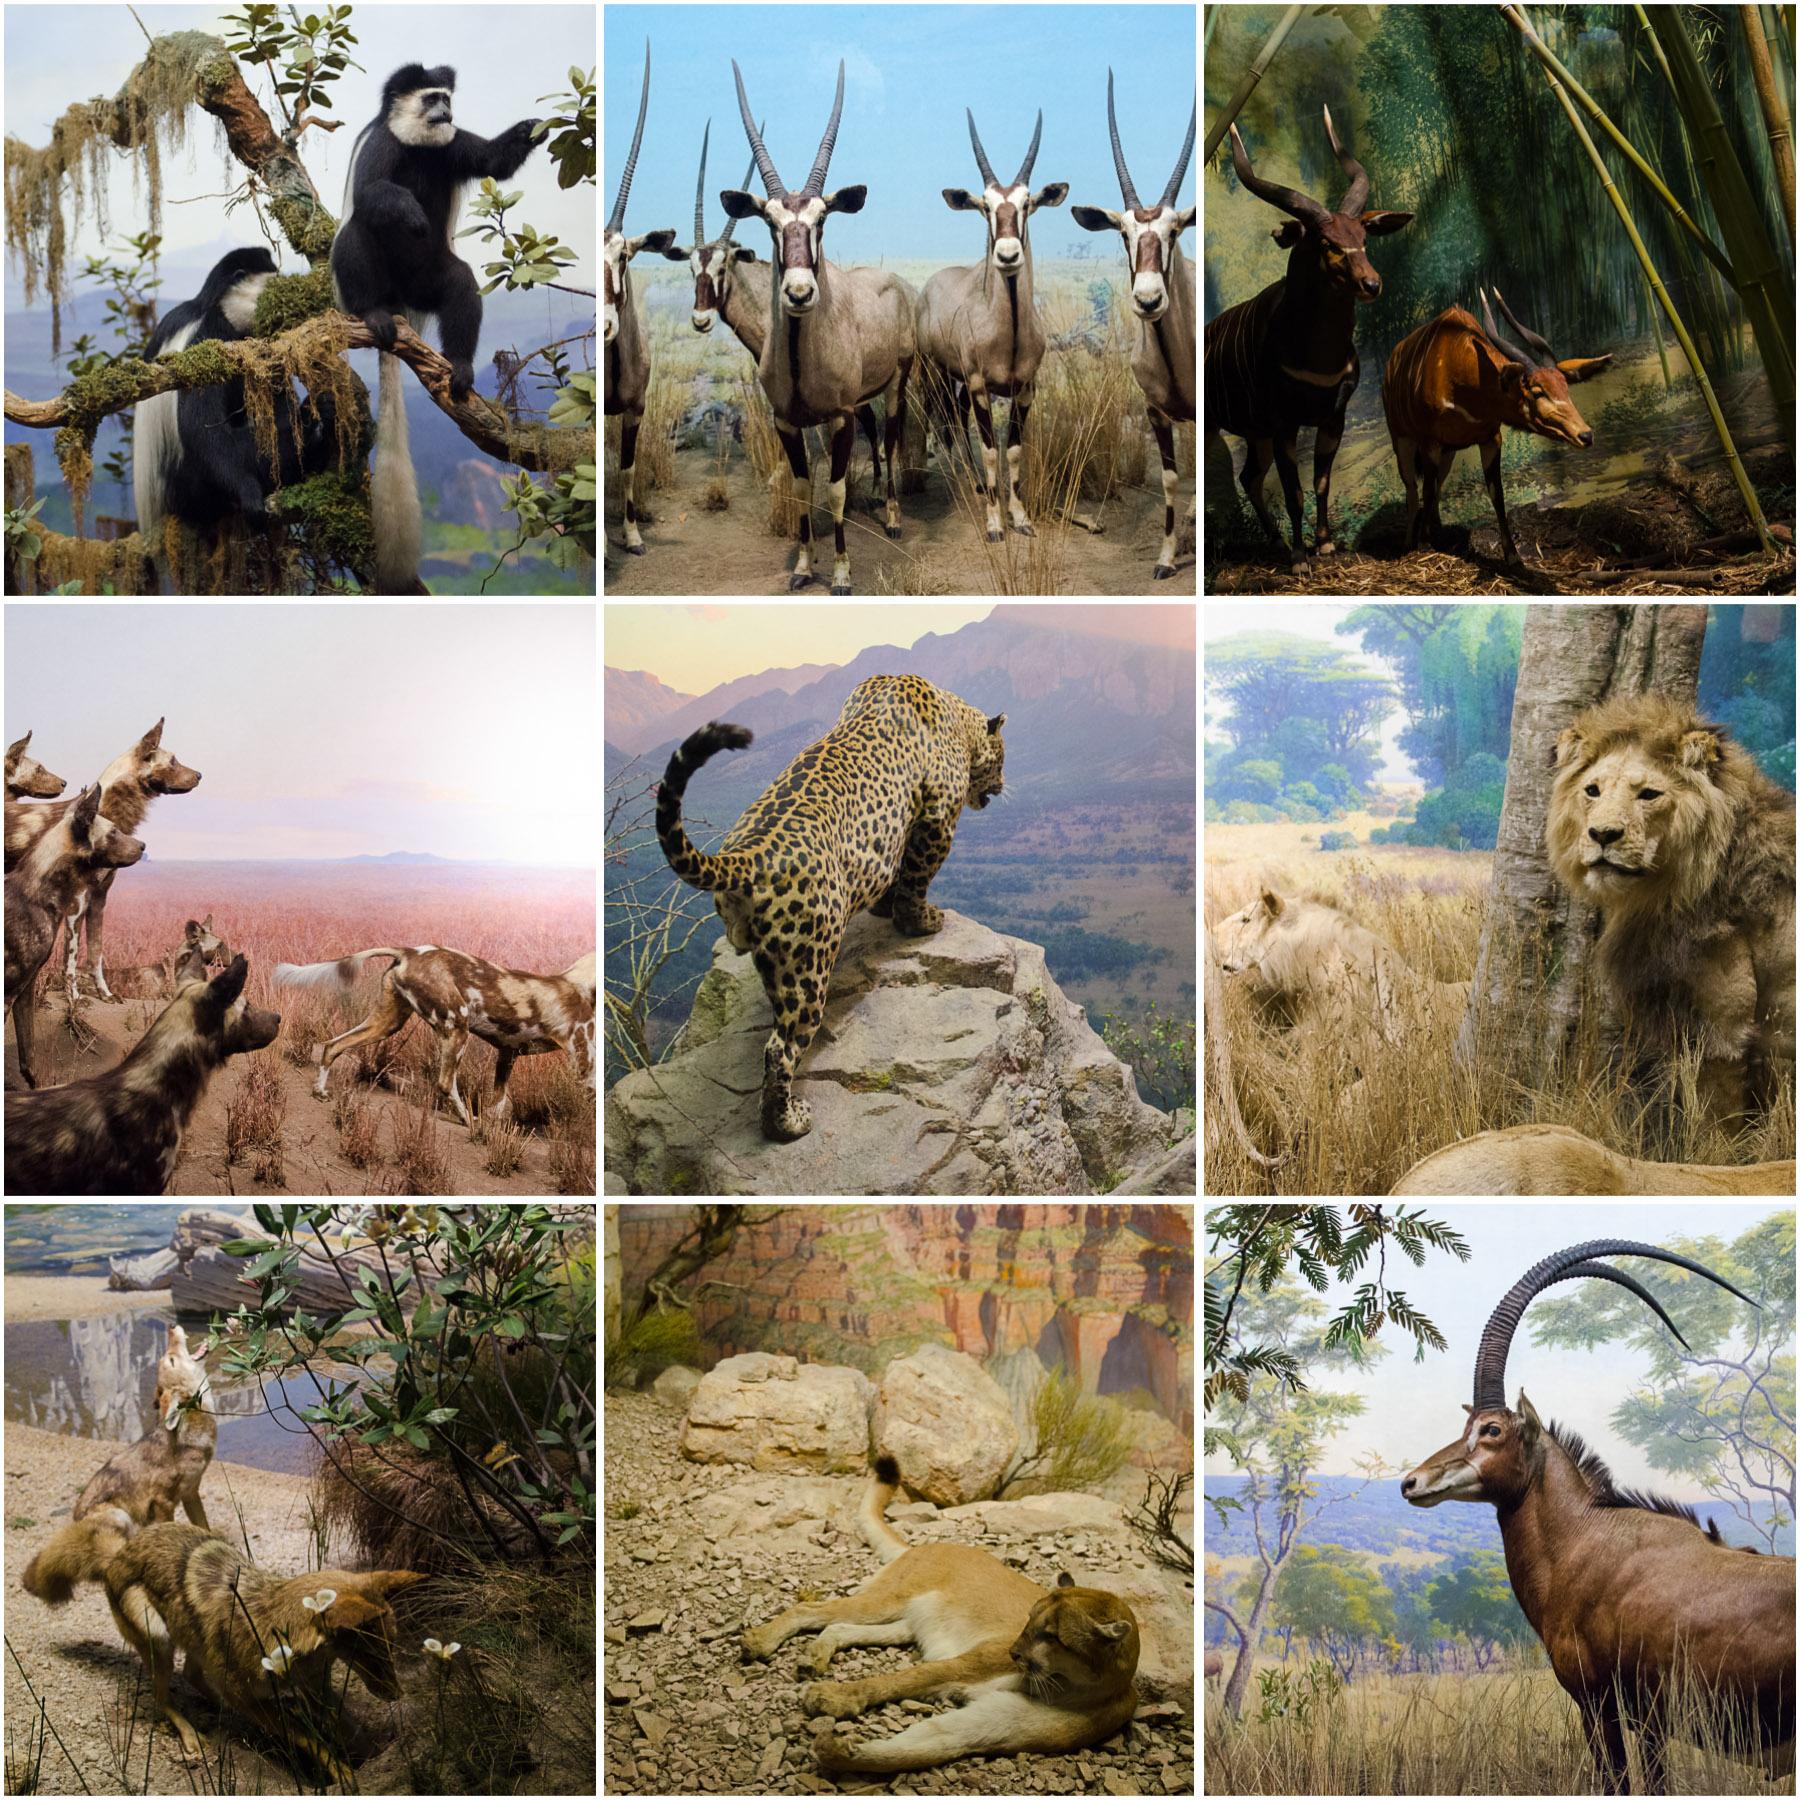 American-Museum-of-Natural-History_9.jpg